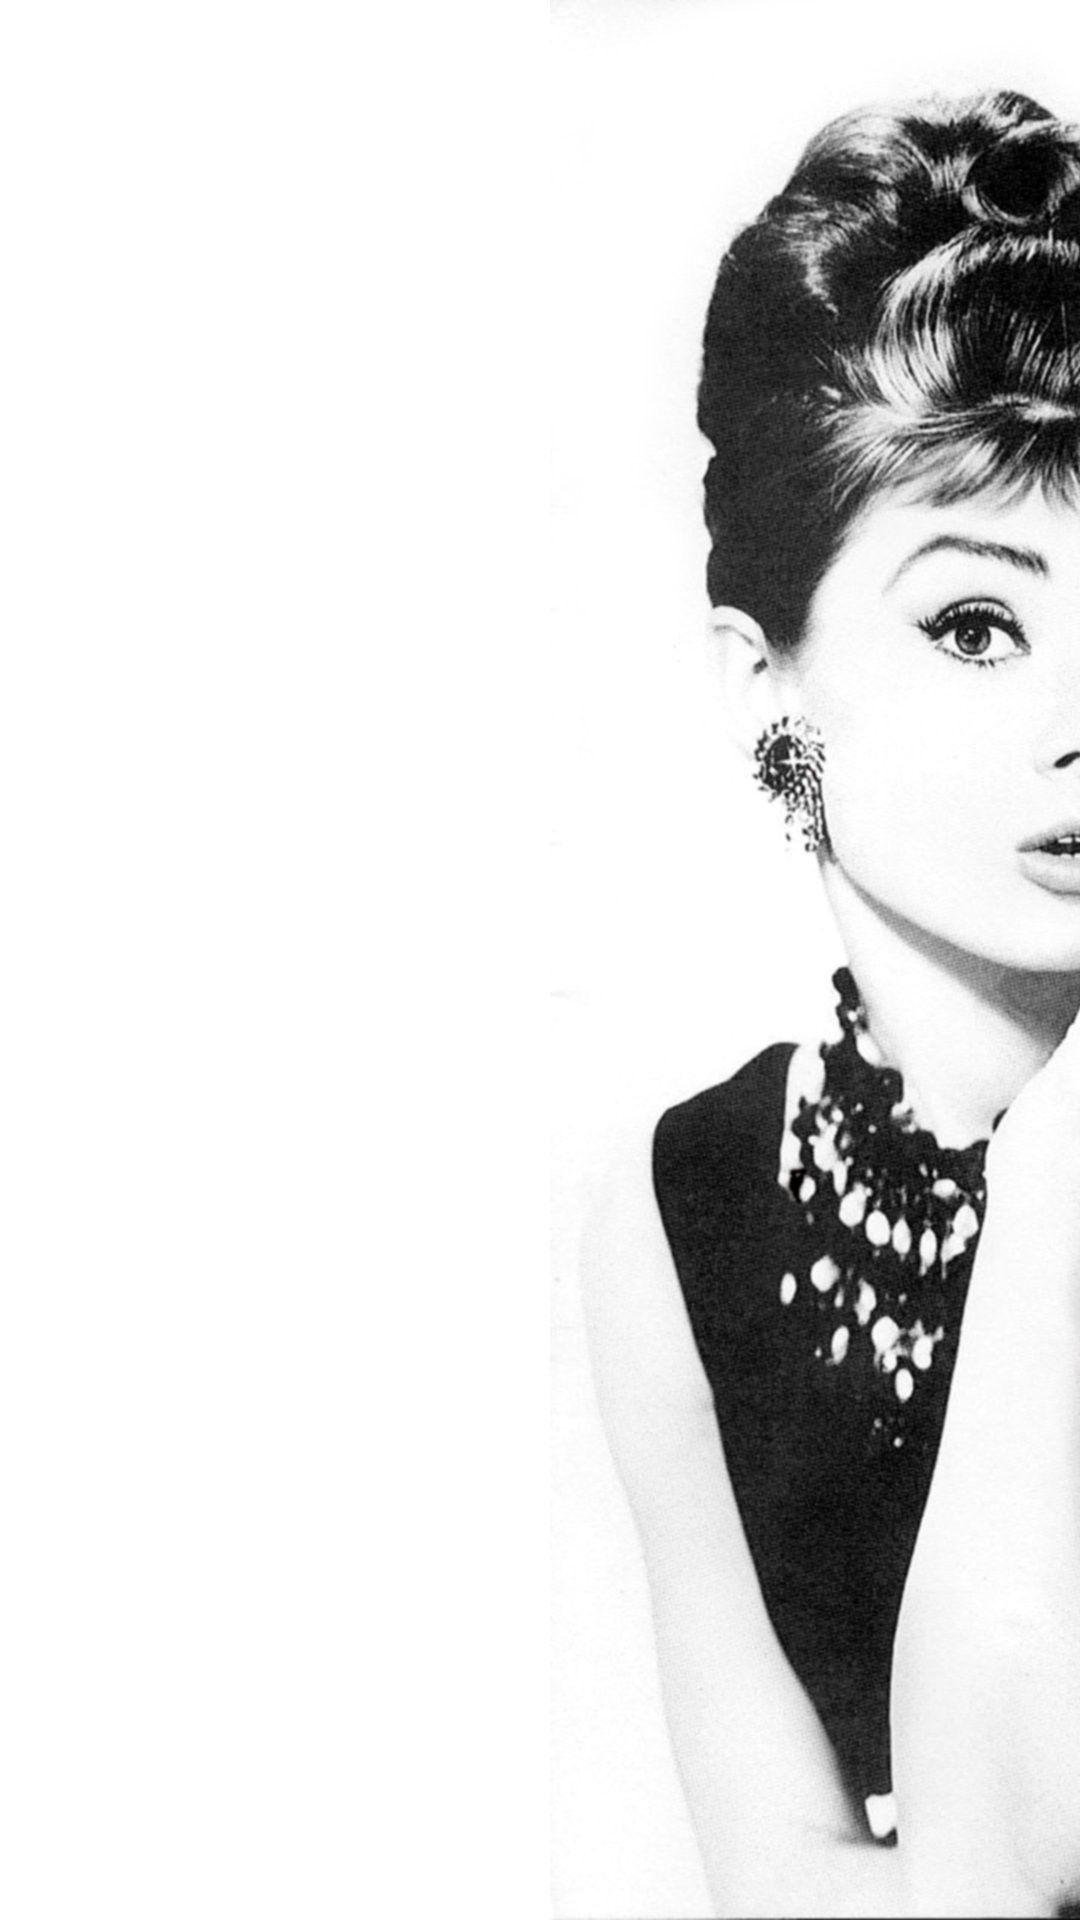 Where to buy Free Audrey Hepburn iPhone 6 Plus Wallpaper 24380 – Celebrities iPhone 6 Plus Wallpapers